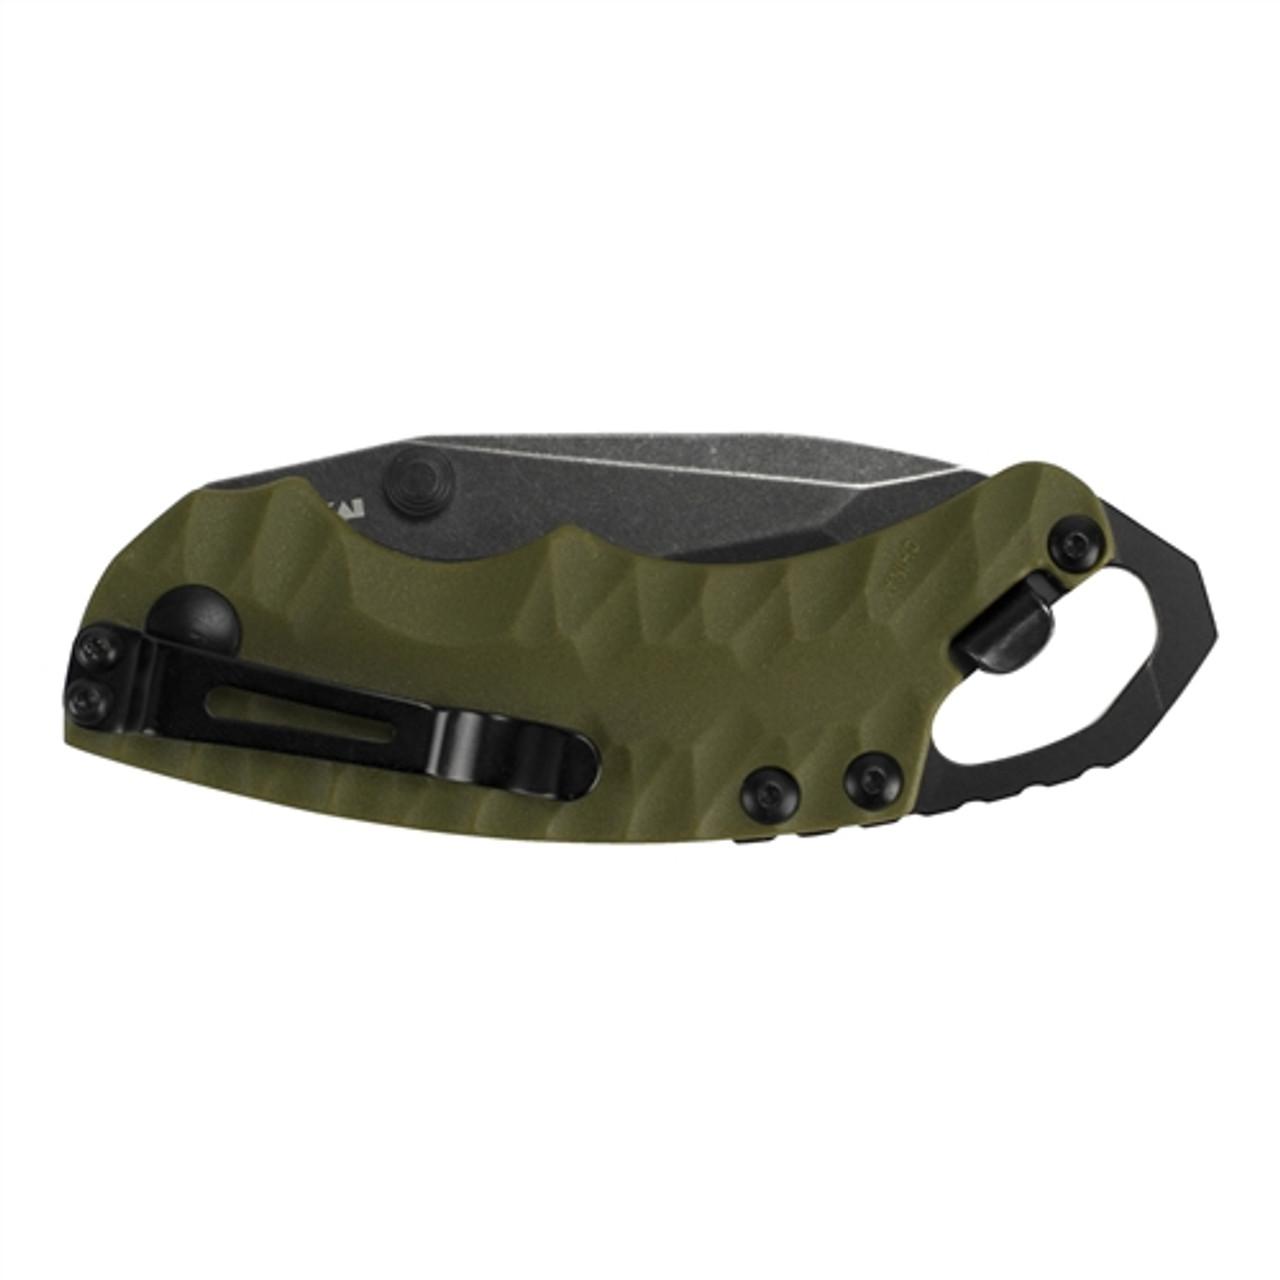 Kershaw 8750TOLBW Olive Shuffle II Tanto Folder Knife, BlackWash Blade REAR VIEW